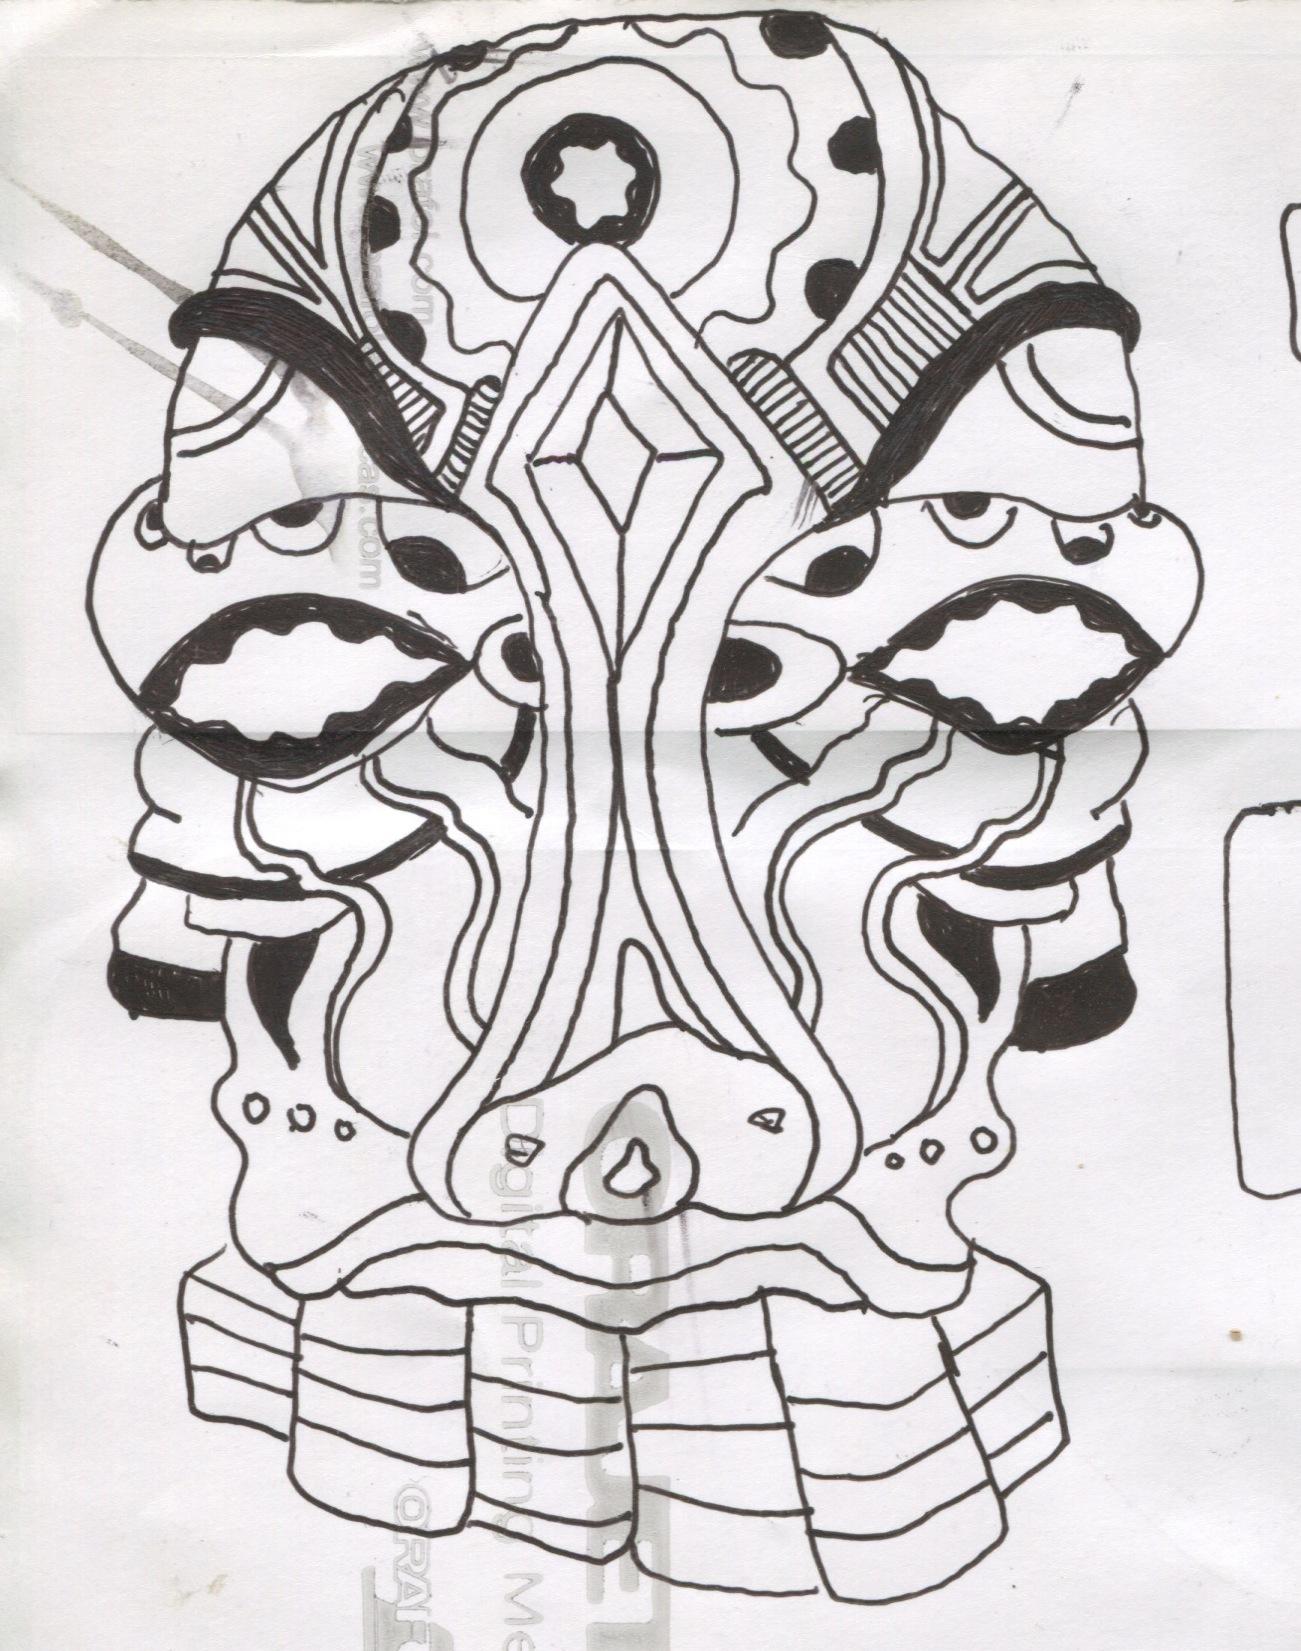 Will Gebhard Graphic Face Singularity Eyes Drawing Pen.jpeg